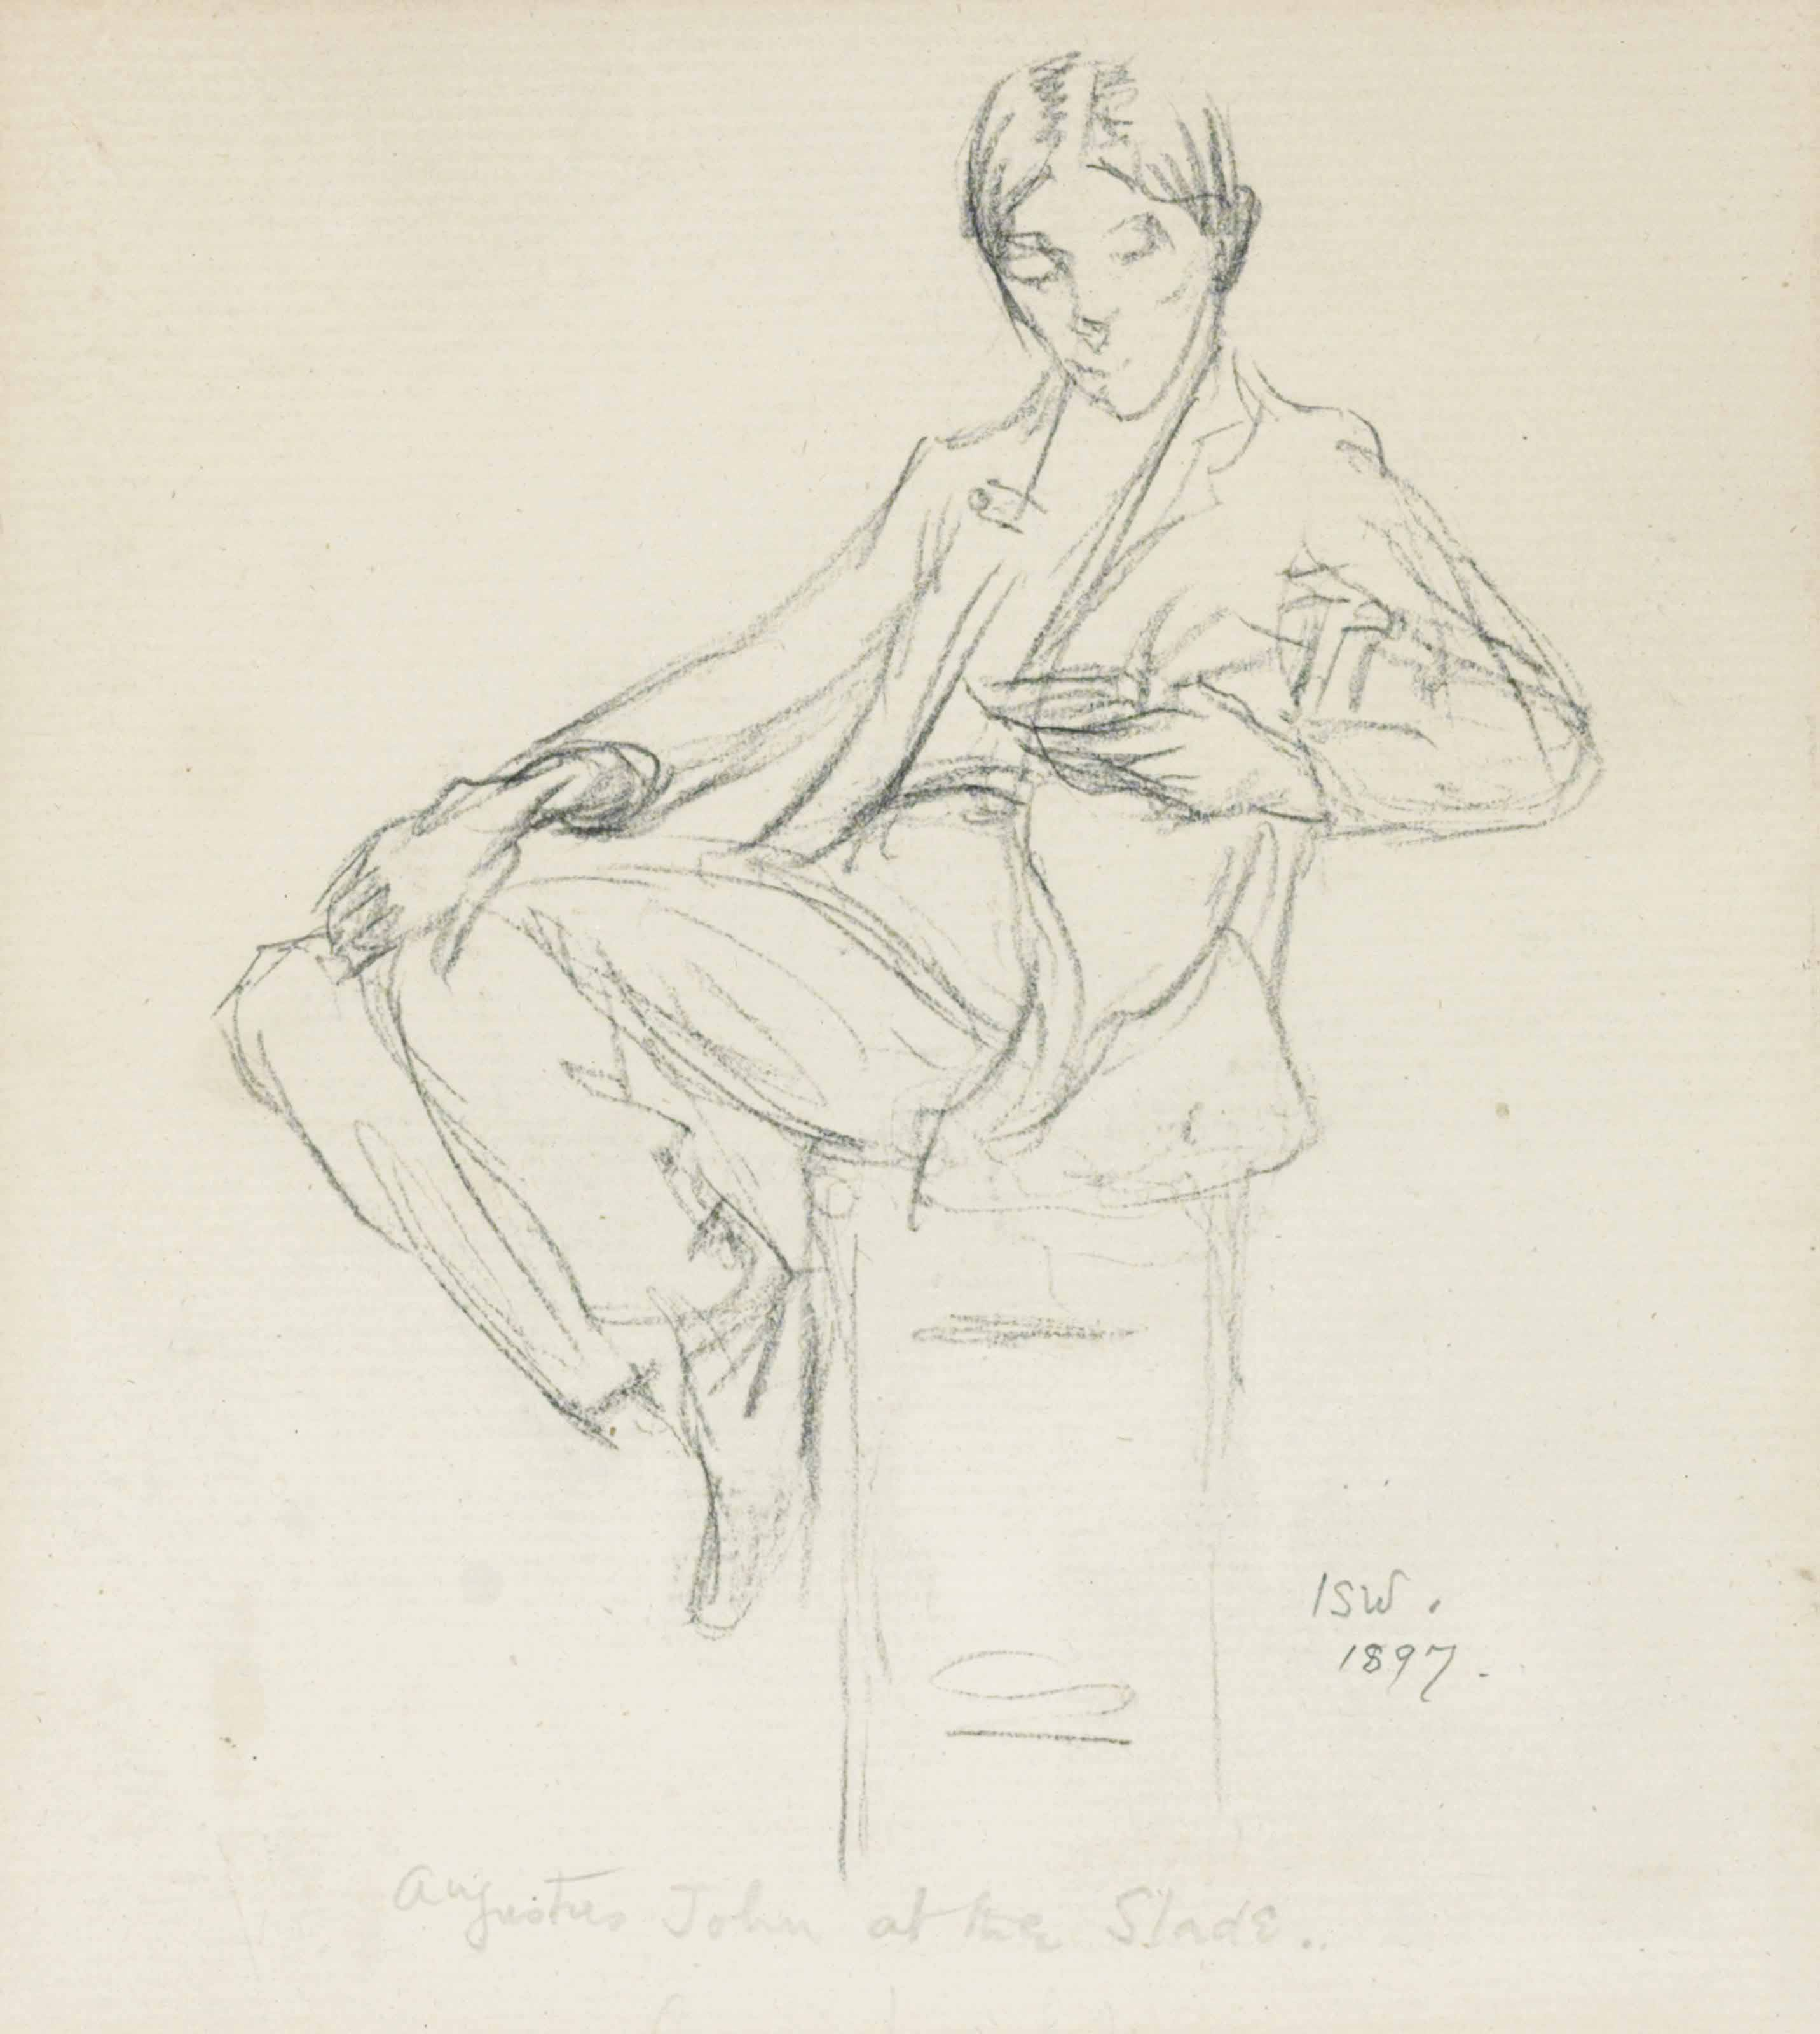 Inglis Sheldon-Williams (Hampshire 1870 - 1940 London)